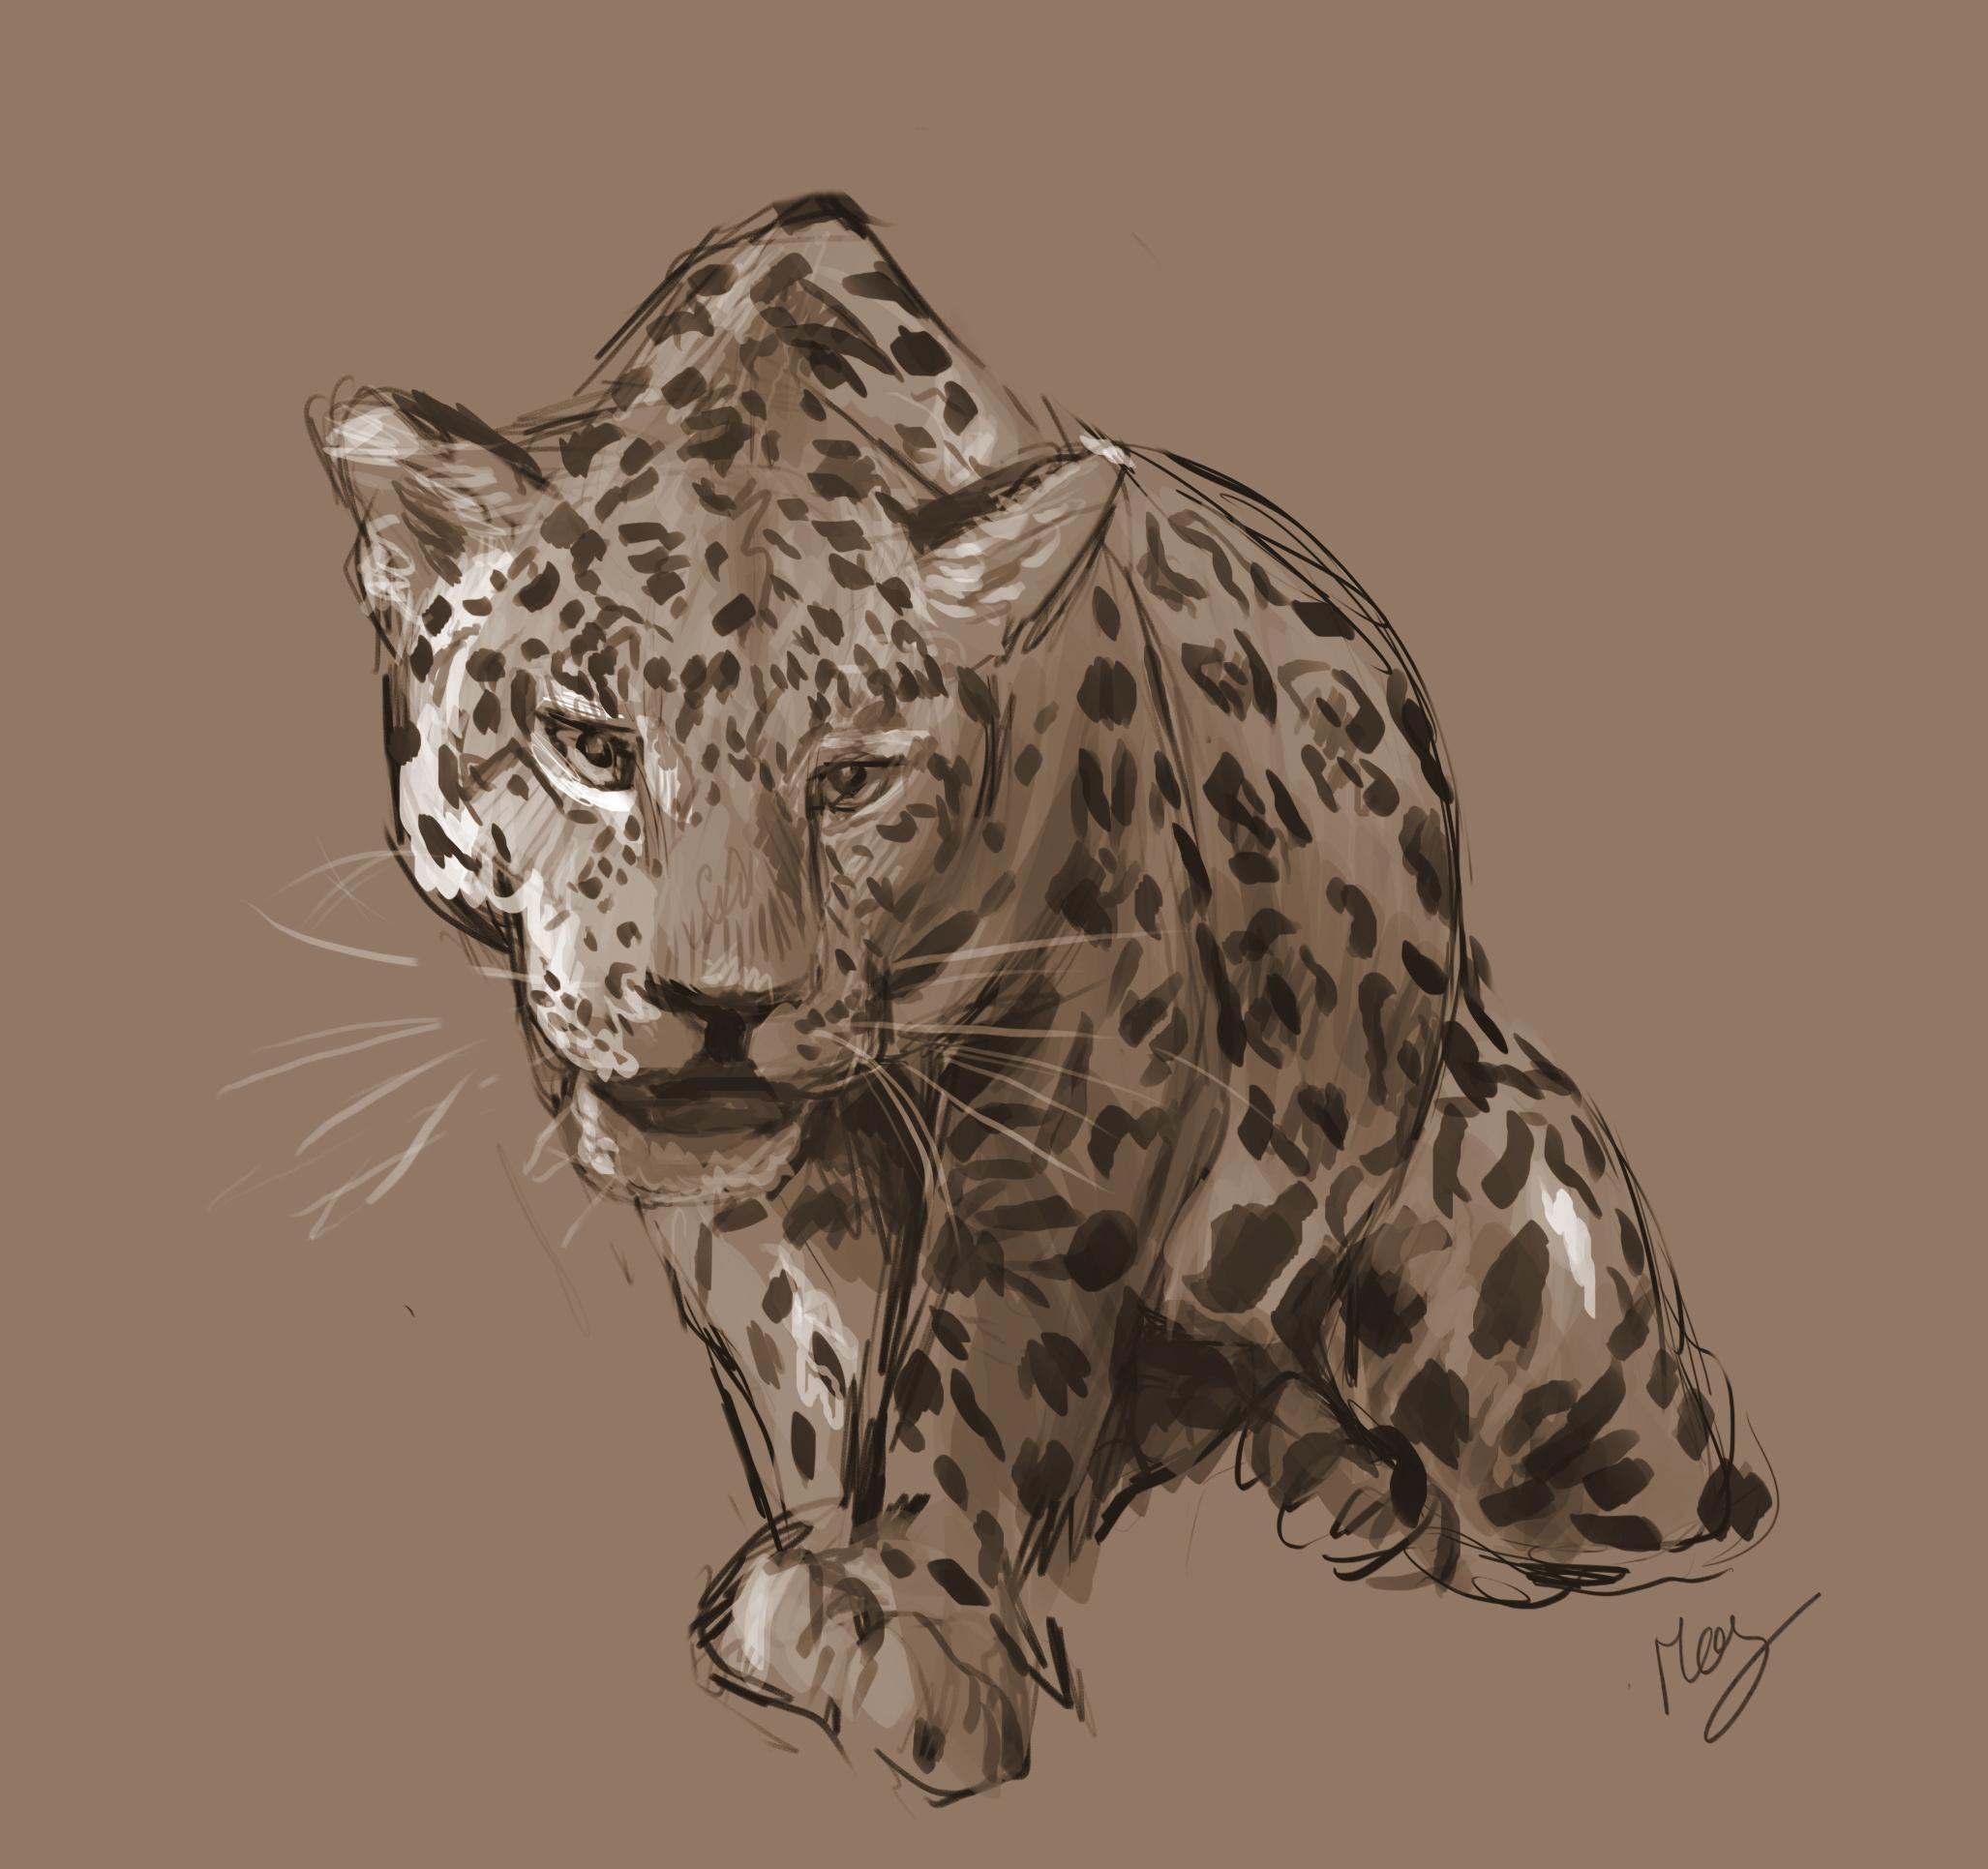 Jaguar study 1